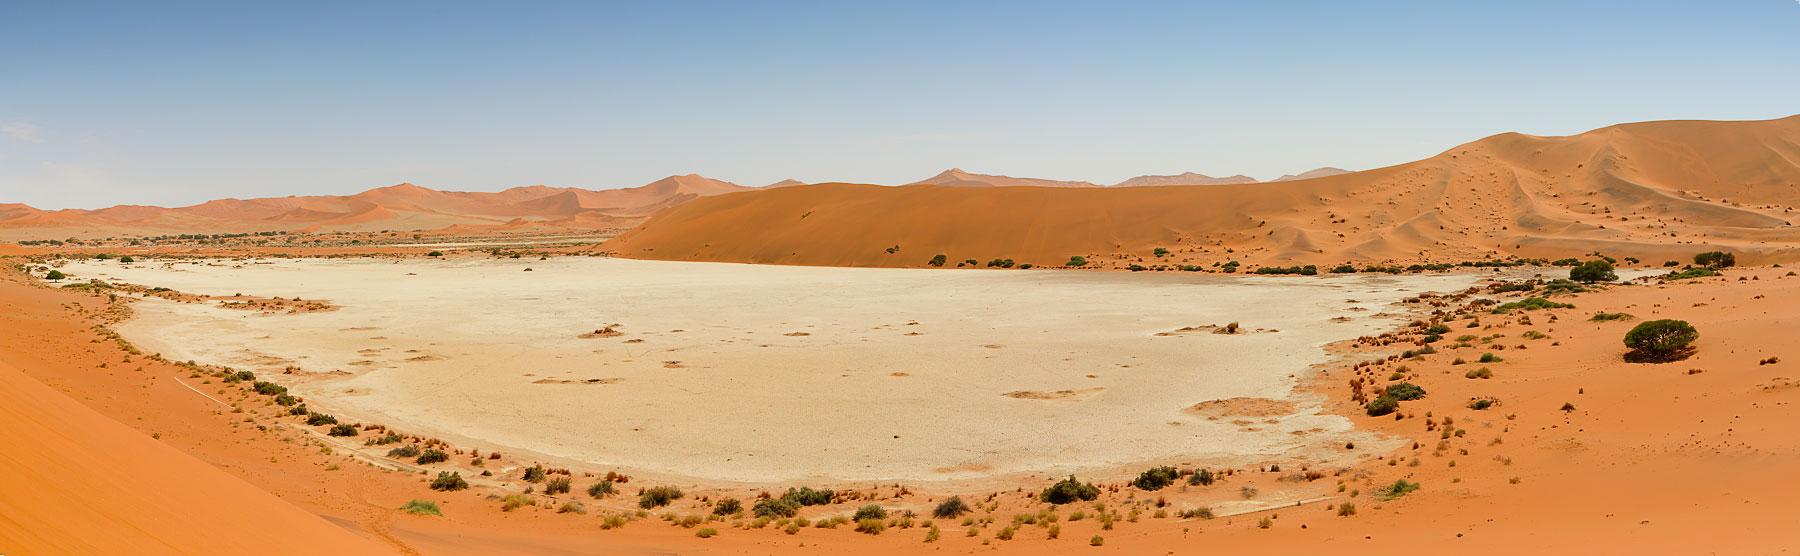 Sossusvlei-Namibie